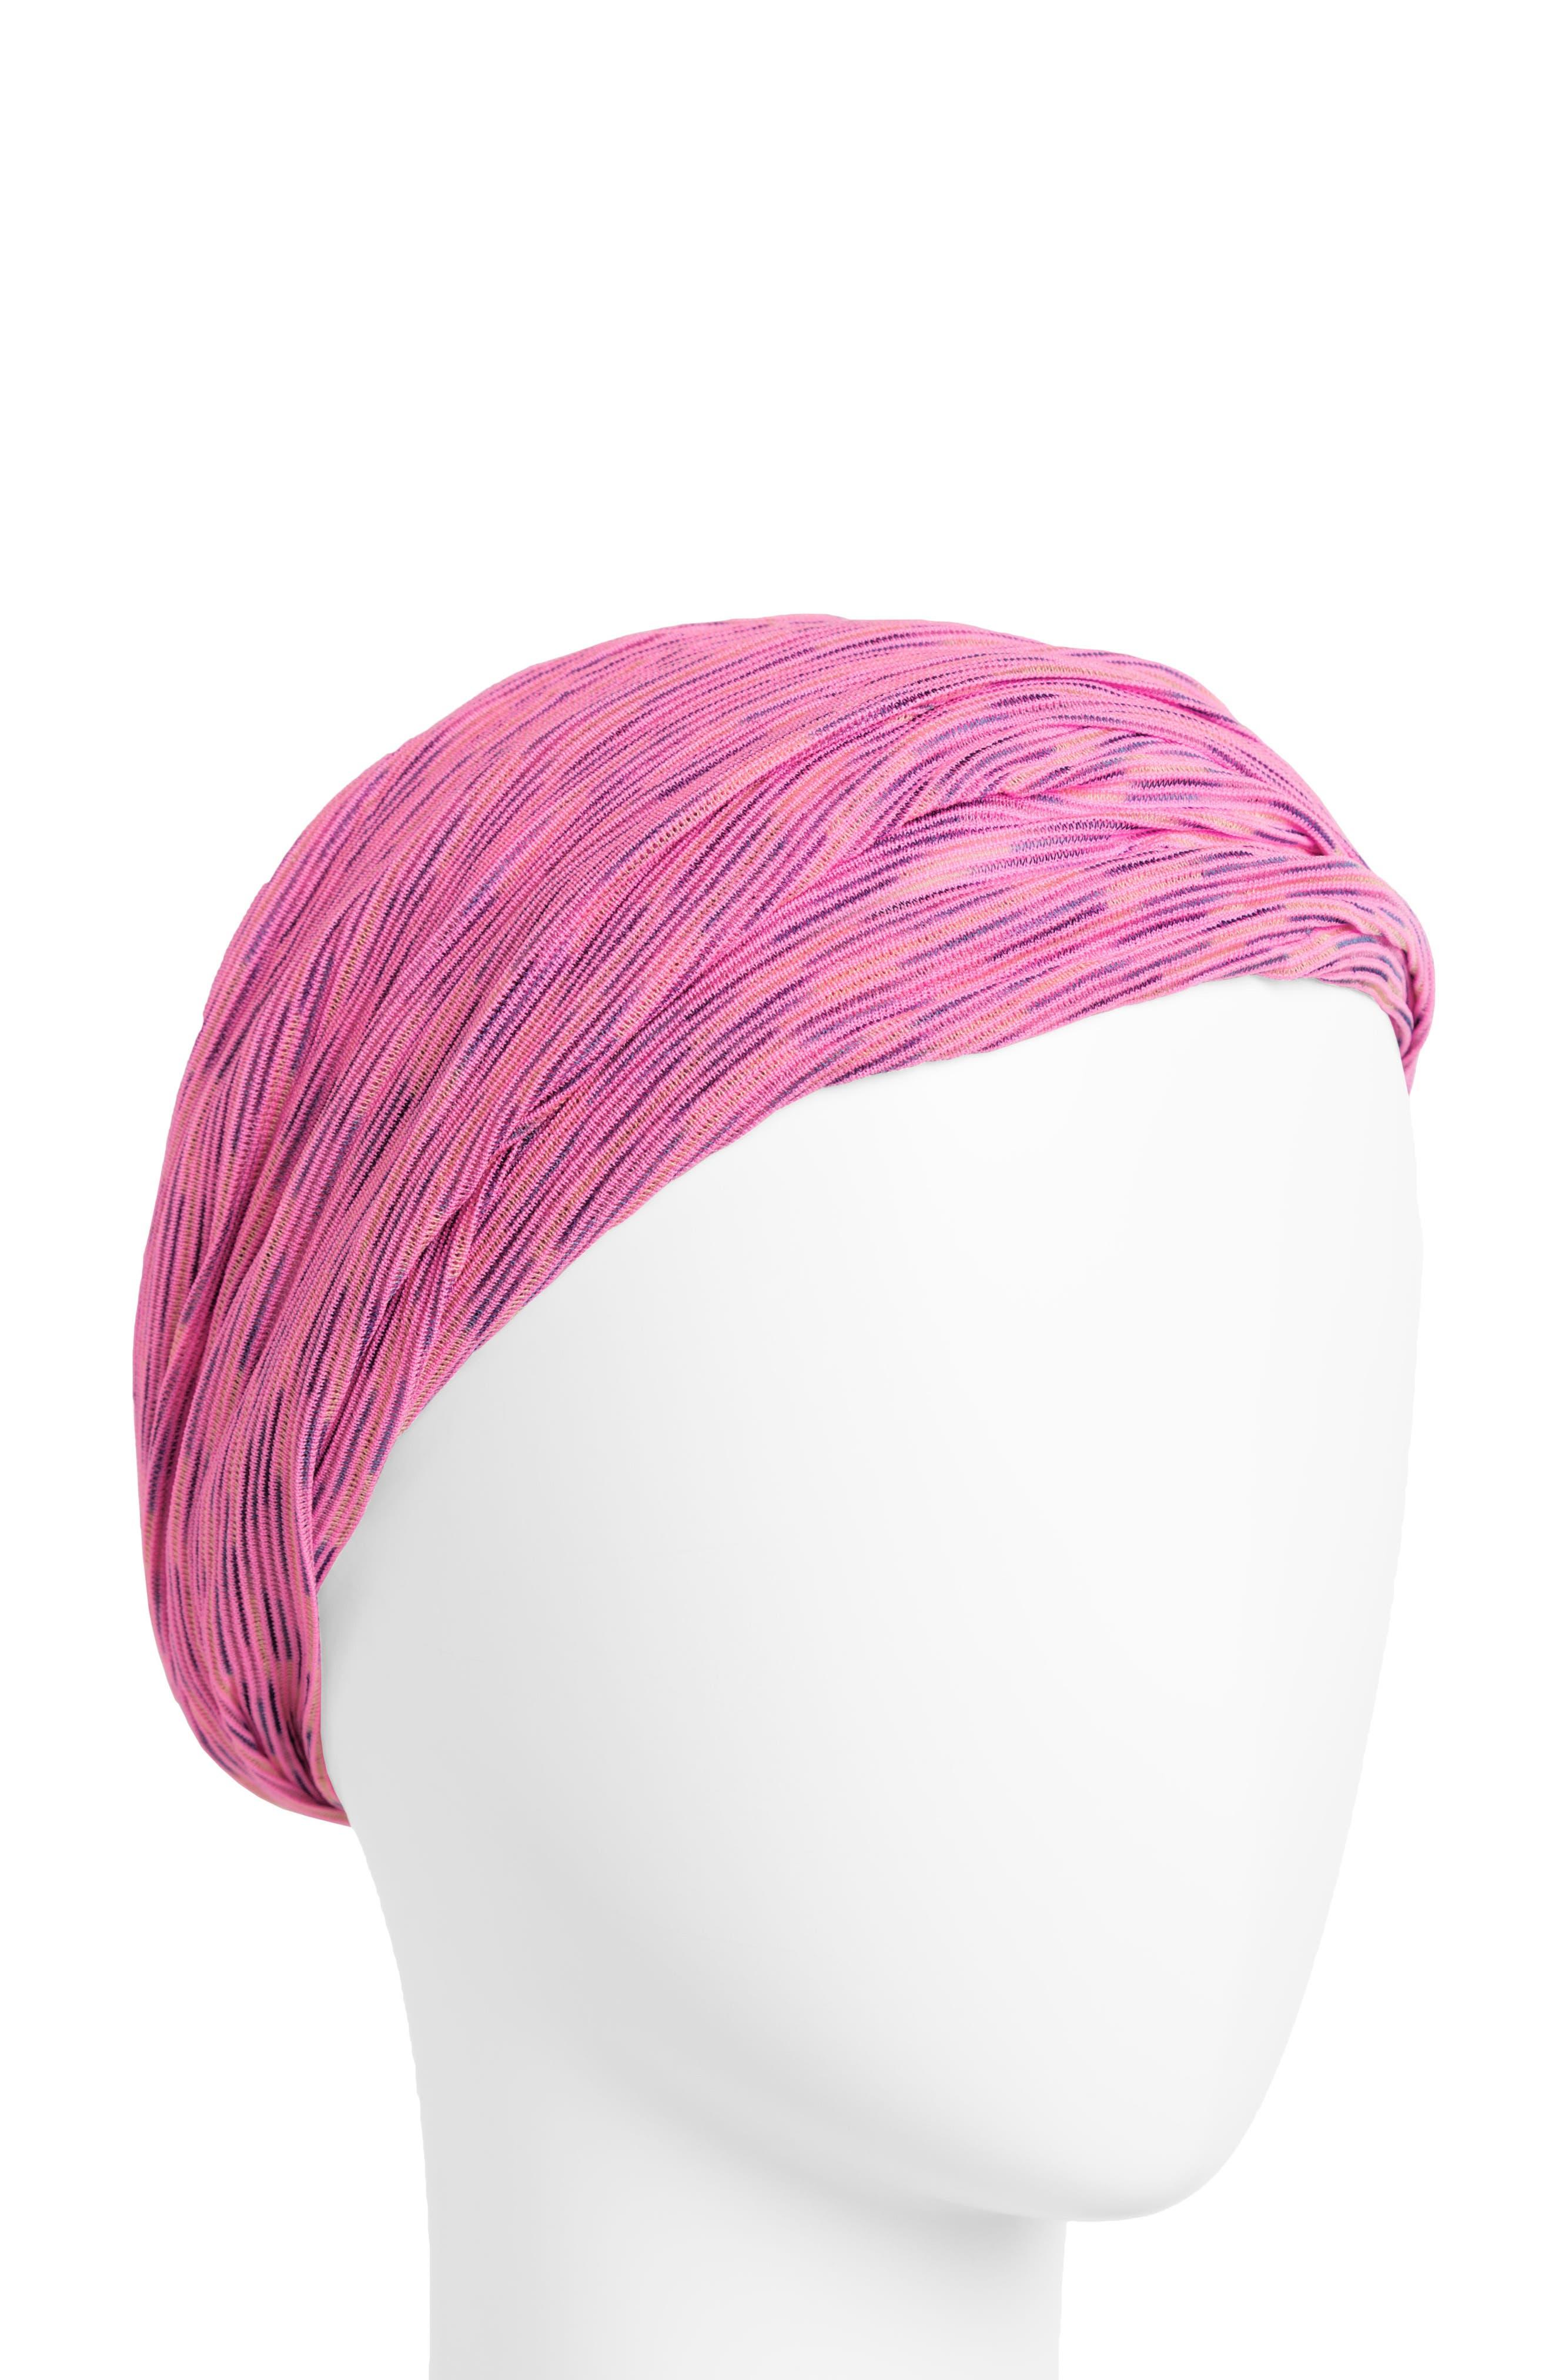 Main Image - L. Erickson Space Dye Relaxed Turban Head Wrap